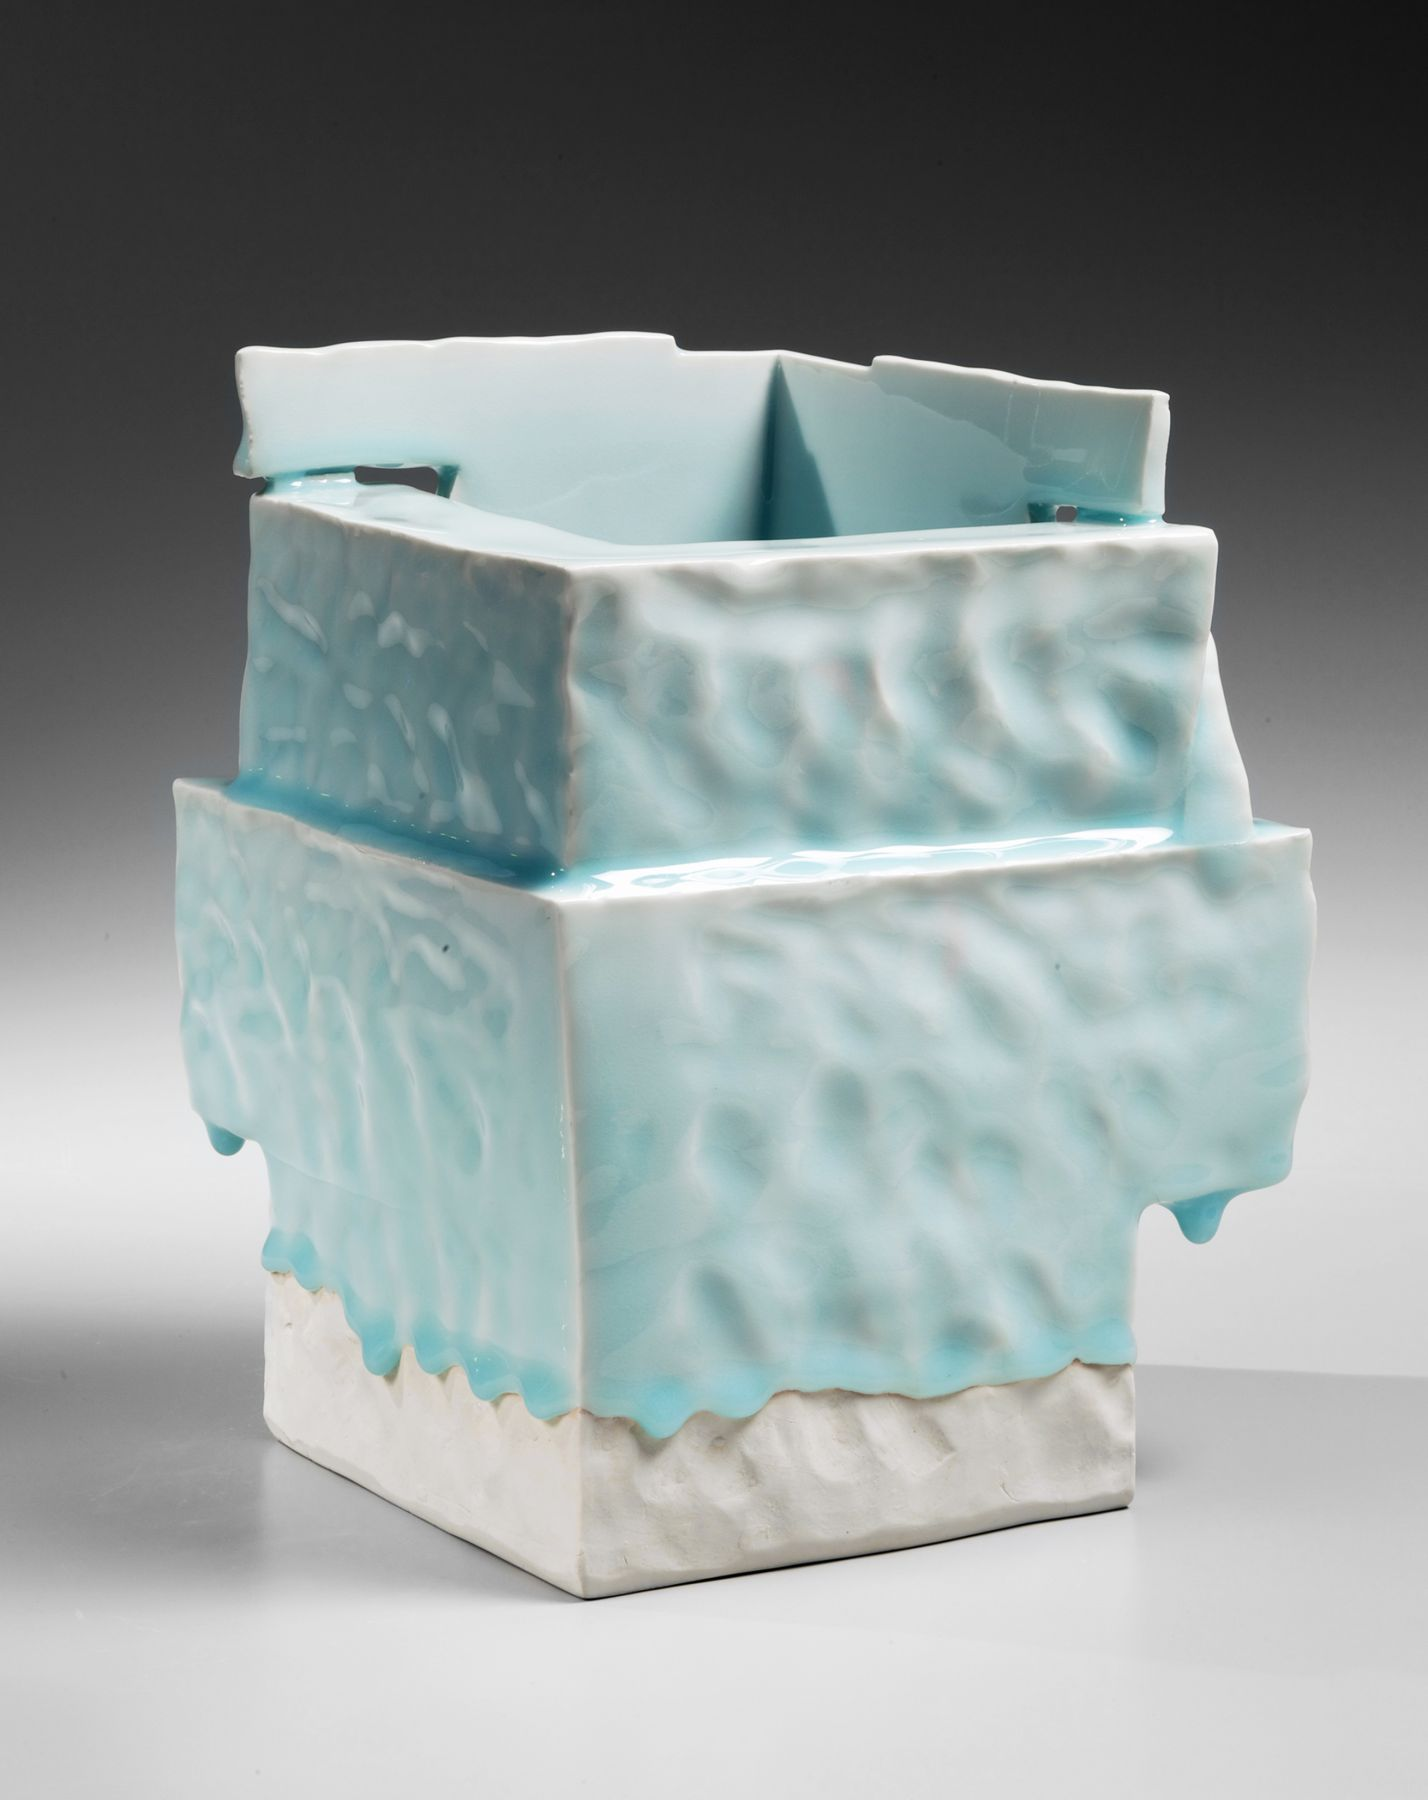 Yoshikawa, Masamichi, Yoshikawa Masamichi, hand-built, cube-shaped, ancient, Chinese, house, sculpture, bluish-white, seihakuji, glaze, 2012, porcelain, contemporary, ceramics, clay, Japanese, Japanese ceramics, Japan, pottery